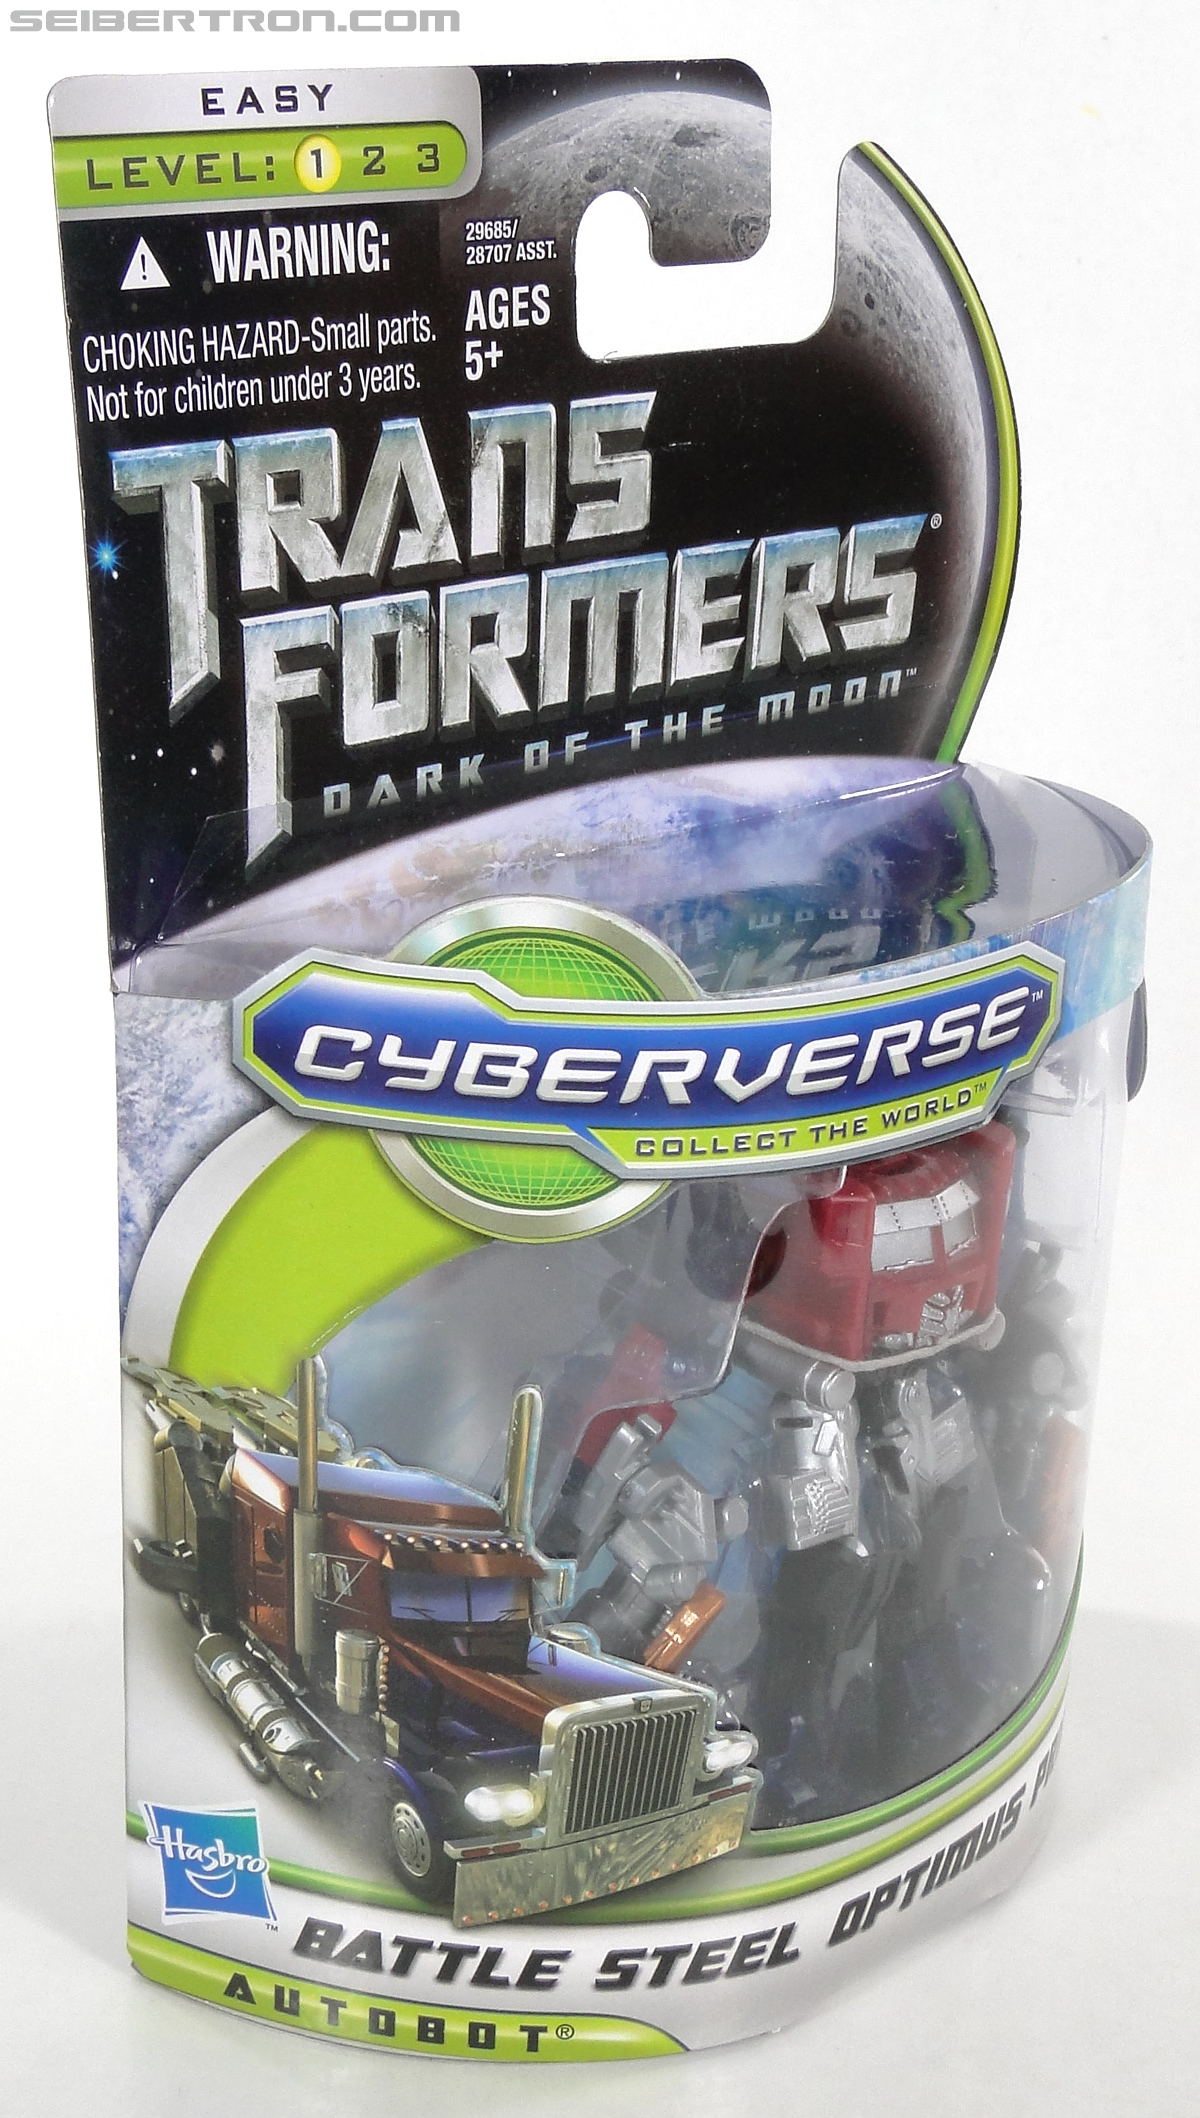 Transformers Dark of the Moon Battle Steel Optimus Prime (Image #6 of 100)